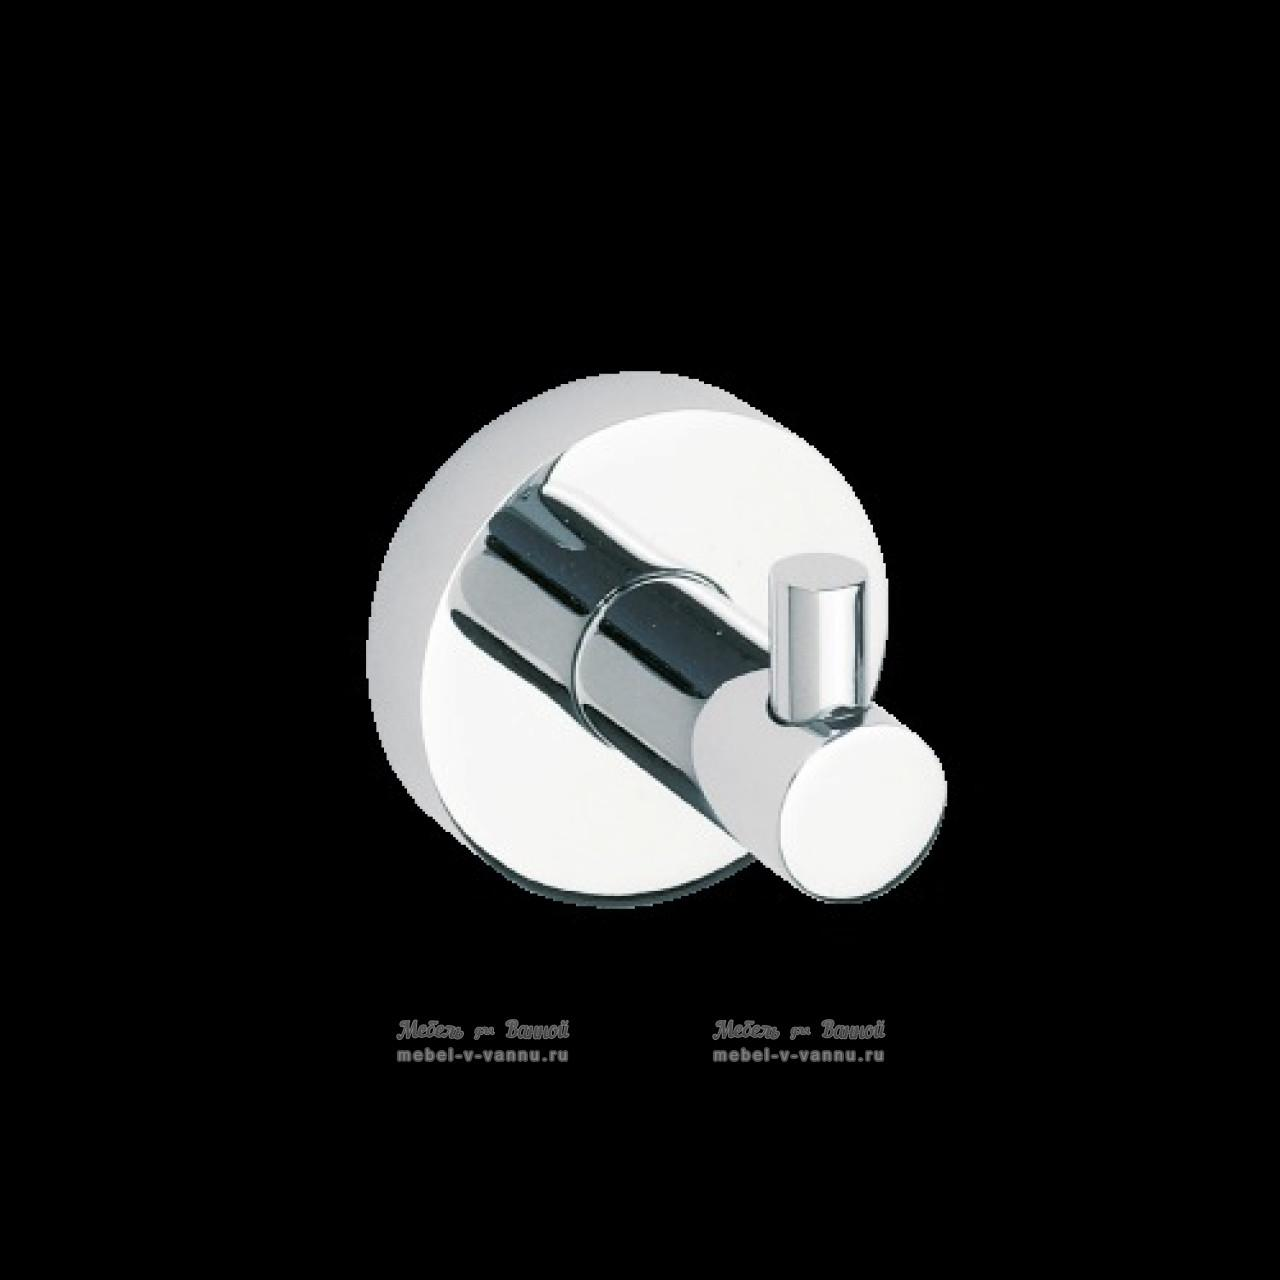 Крючок BEMETA OMEGA 104106022 55 мм купить в Москве по цене от 580р. в интернет-магазине mebel-v-vannu.ru